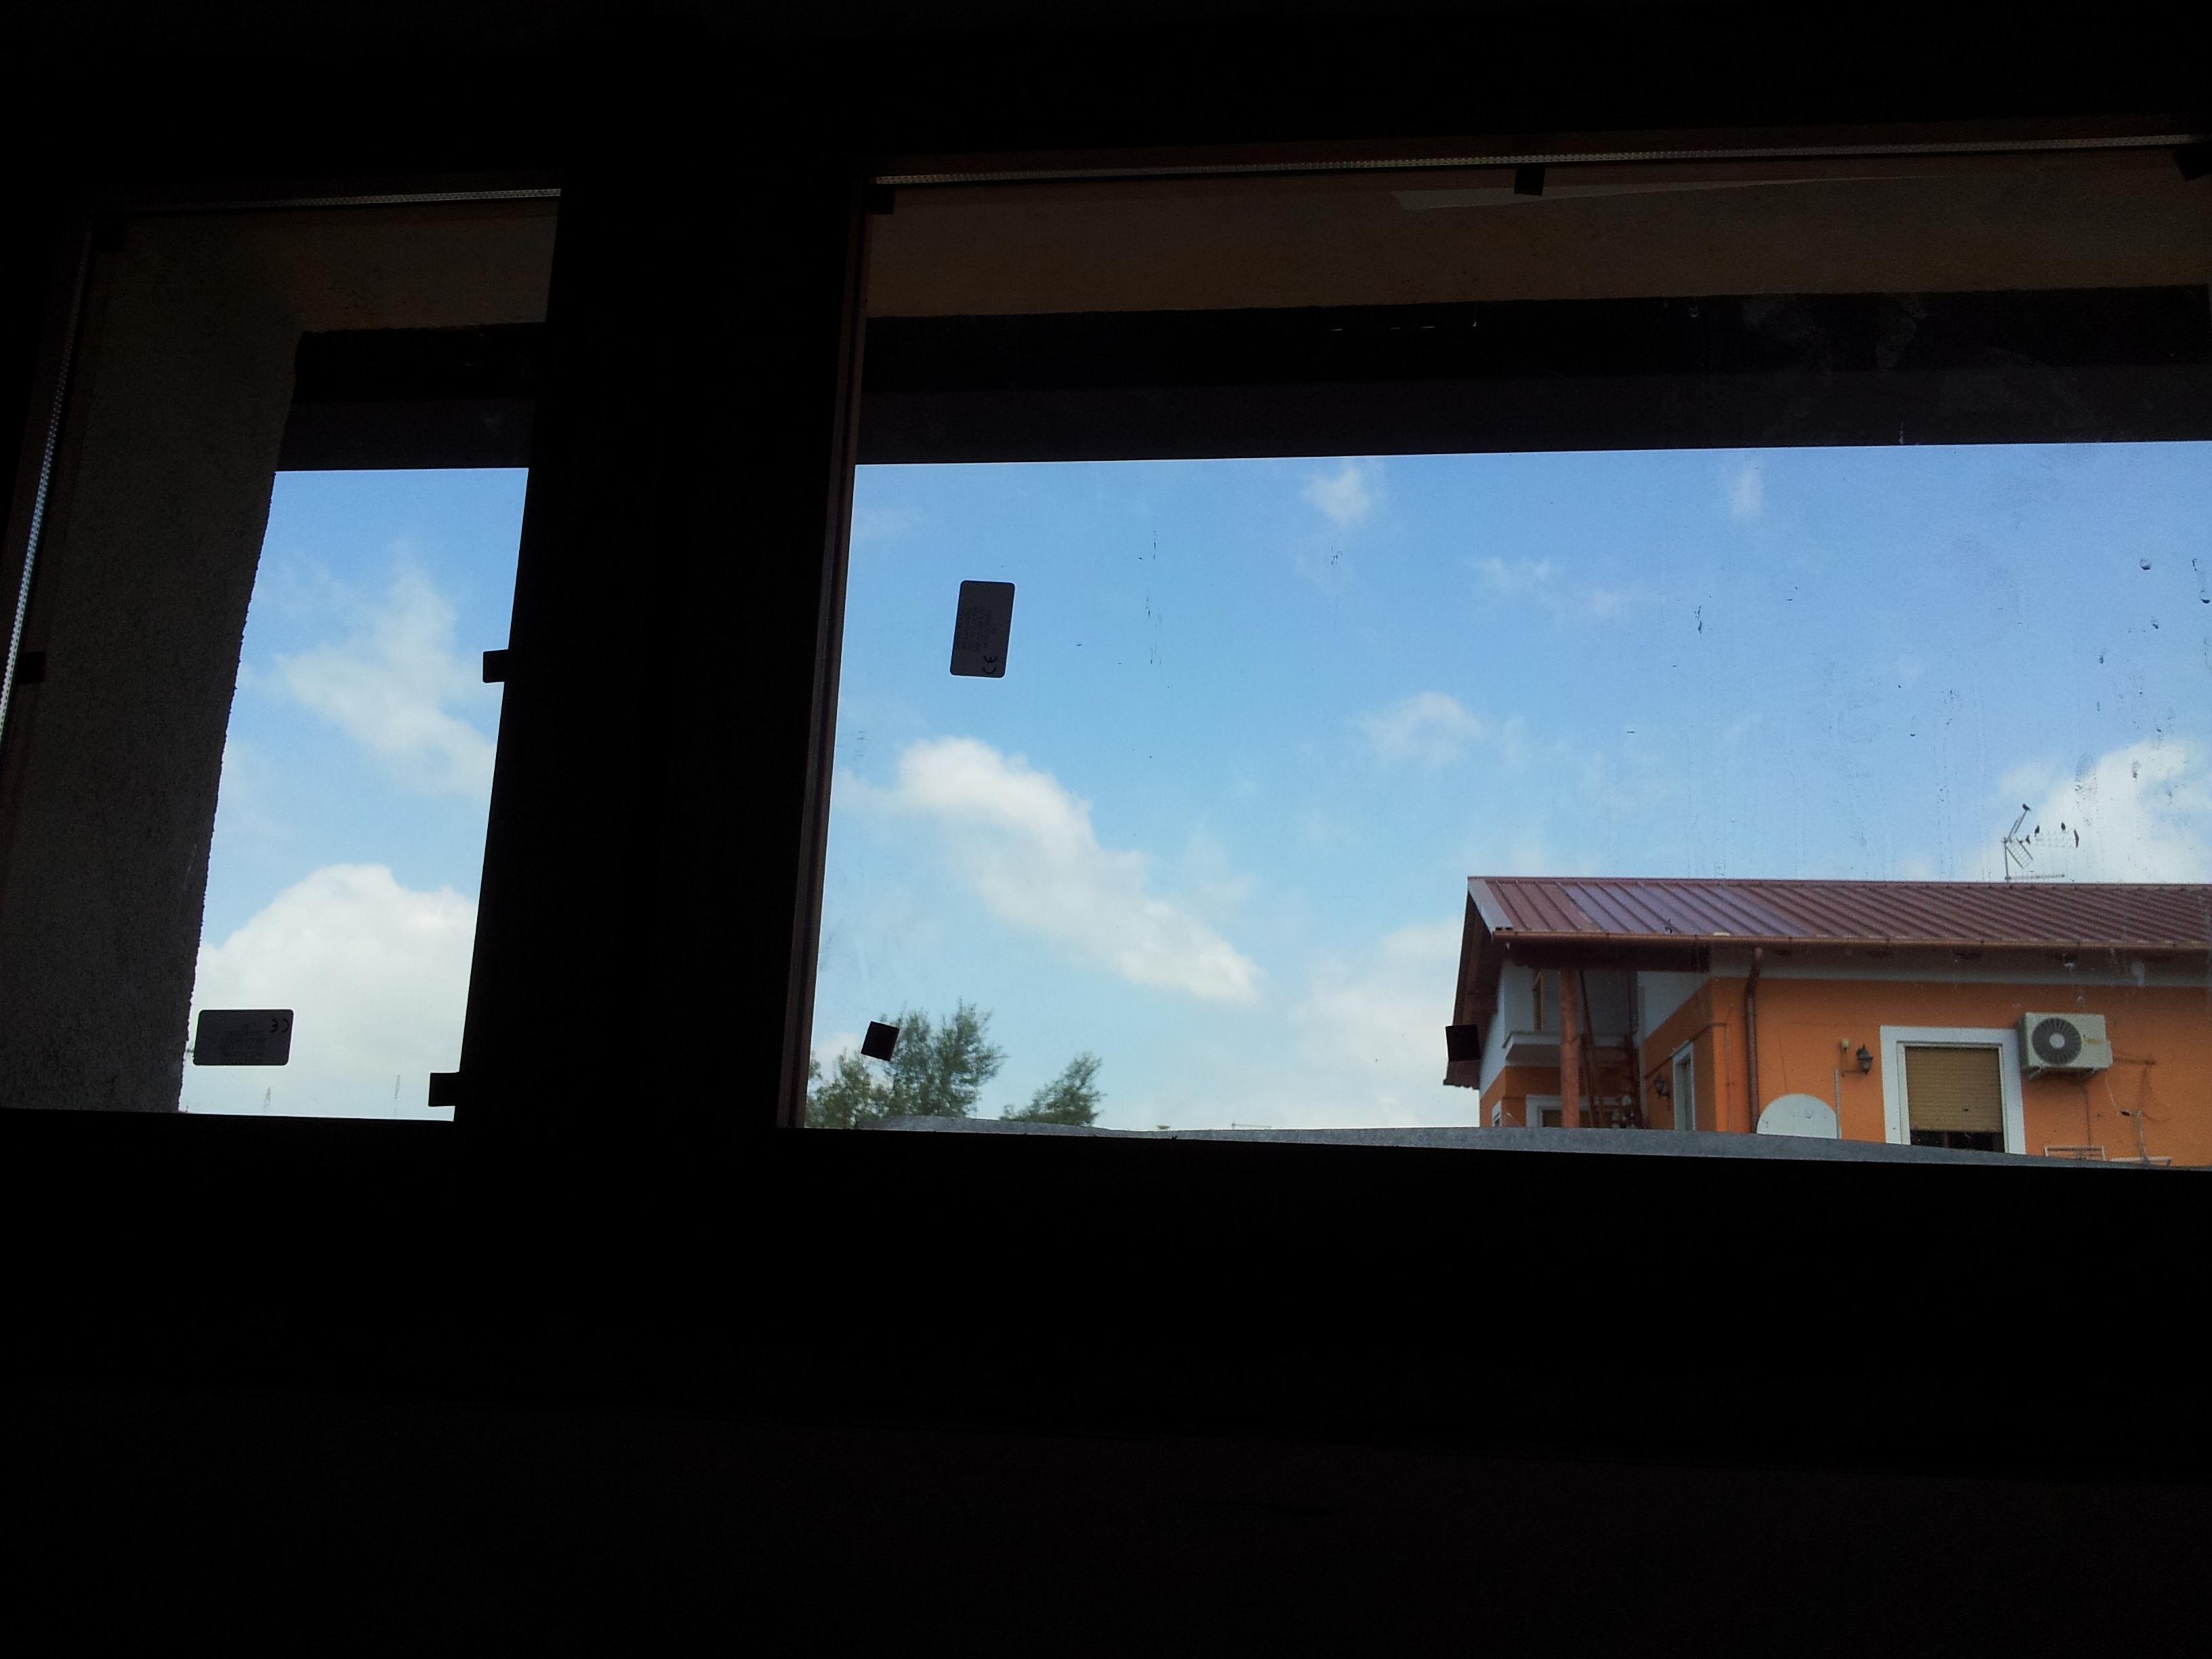 Finestre in lamellare di rovere finestre in legno - Finestre in legno lamellare ...